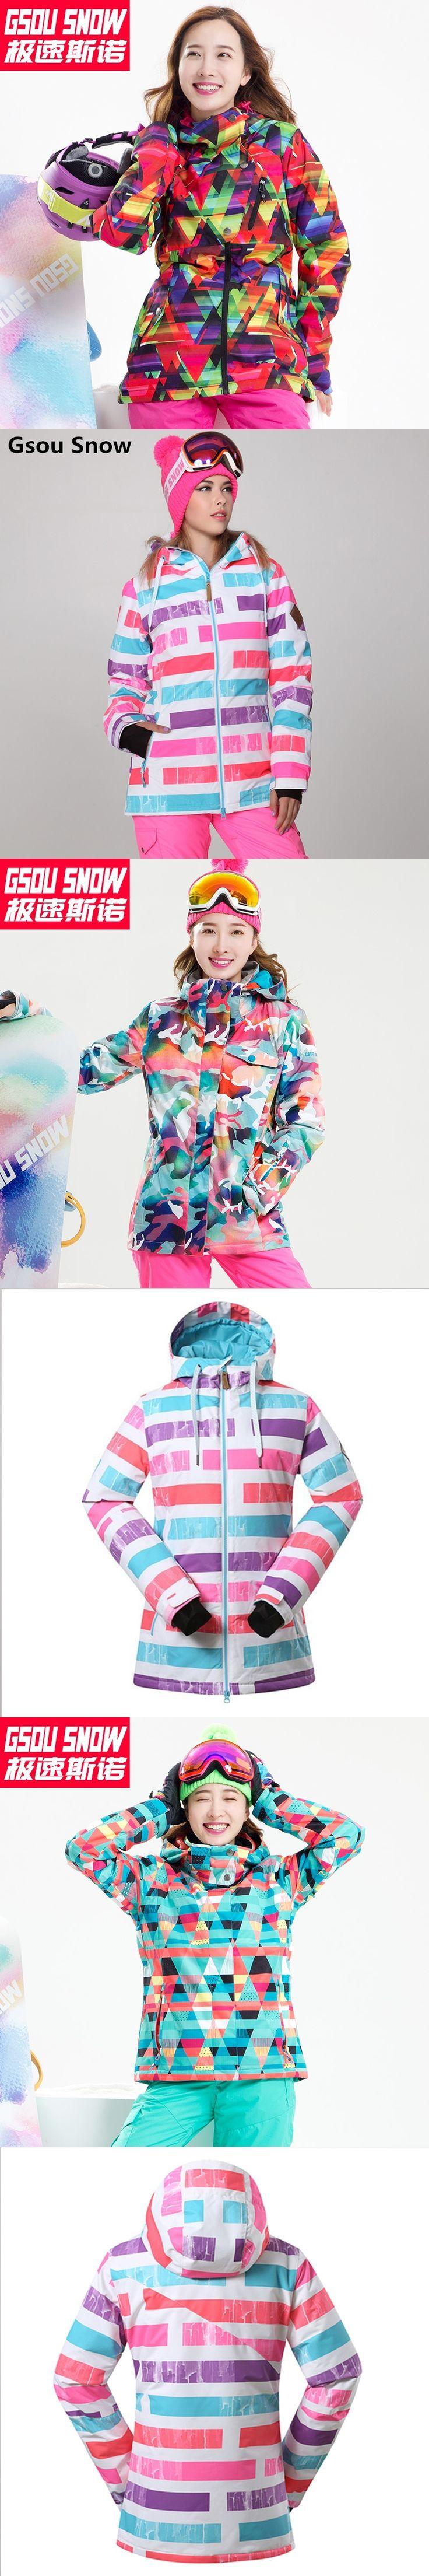 Gsou Snow winter ski suit female ski jacket women snow snowboard jackets mountain skiing chaqueta nieve mujer ski jas vrouwen